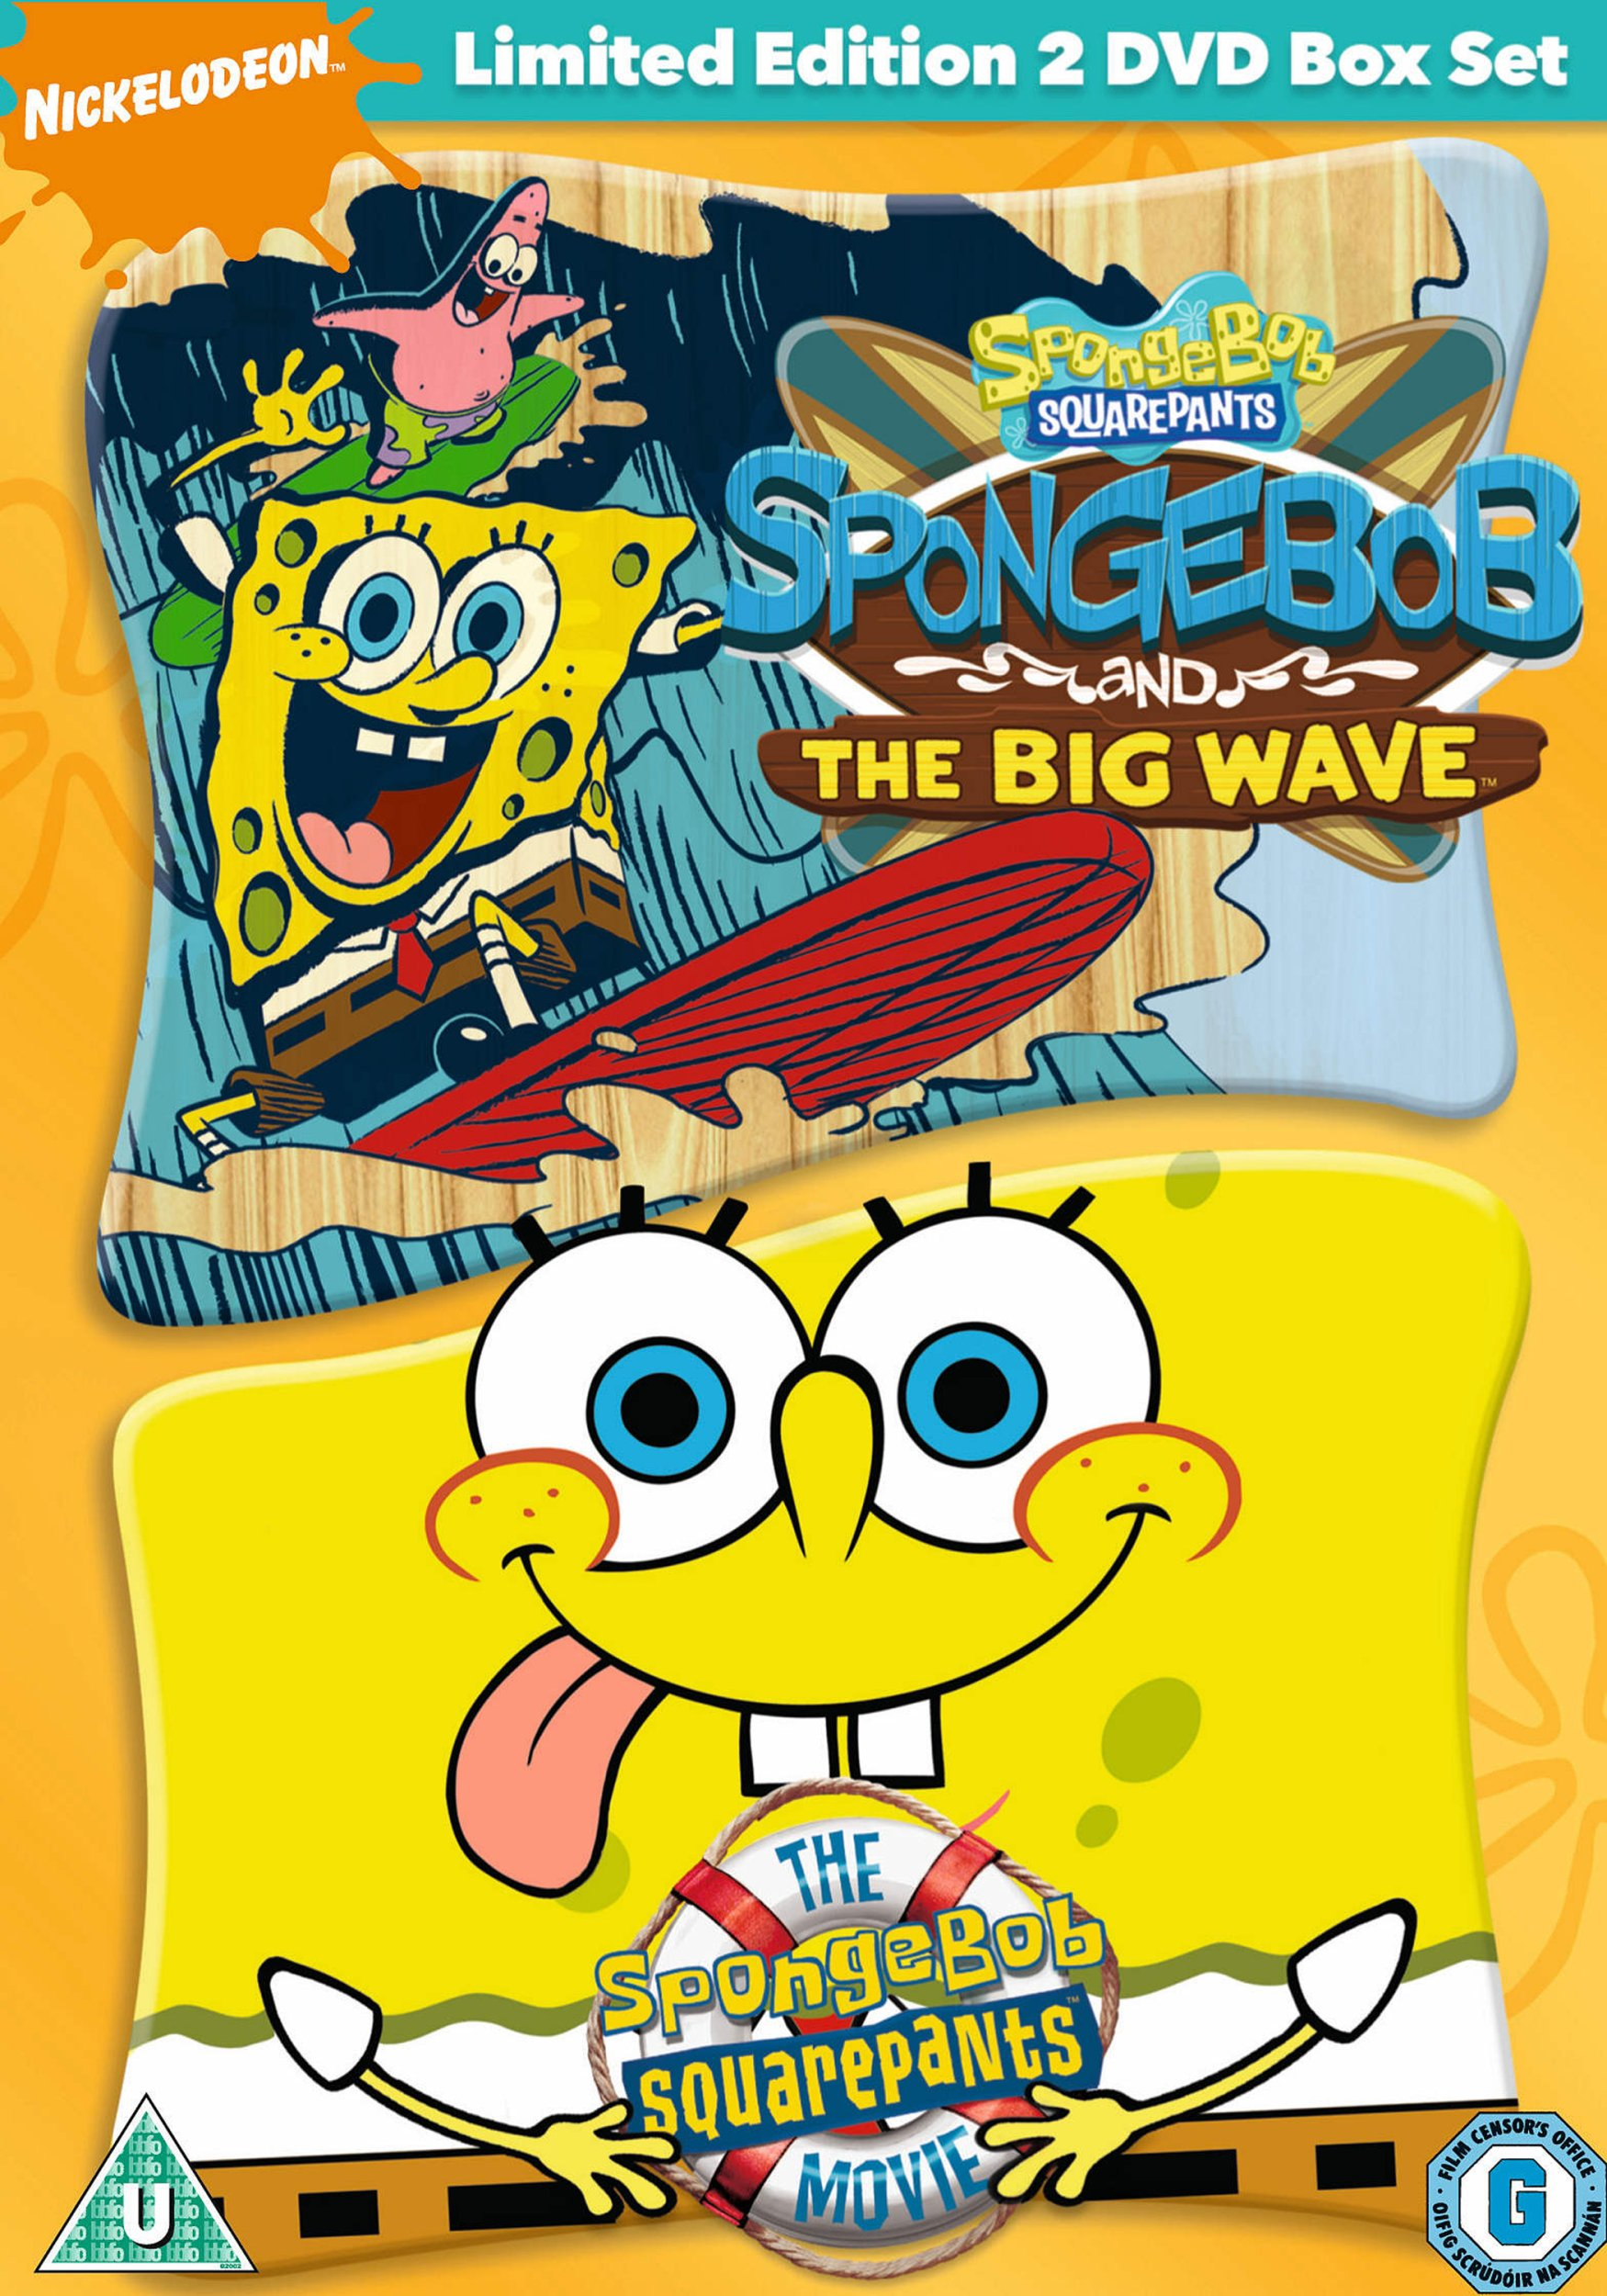 Limited Edition 2 DVD Box Set